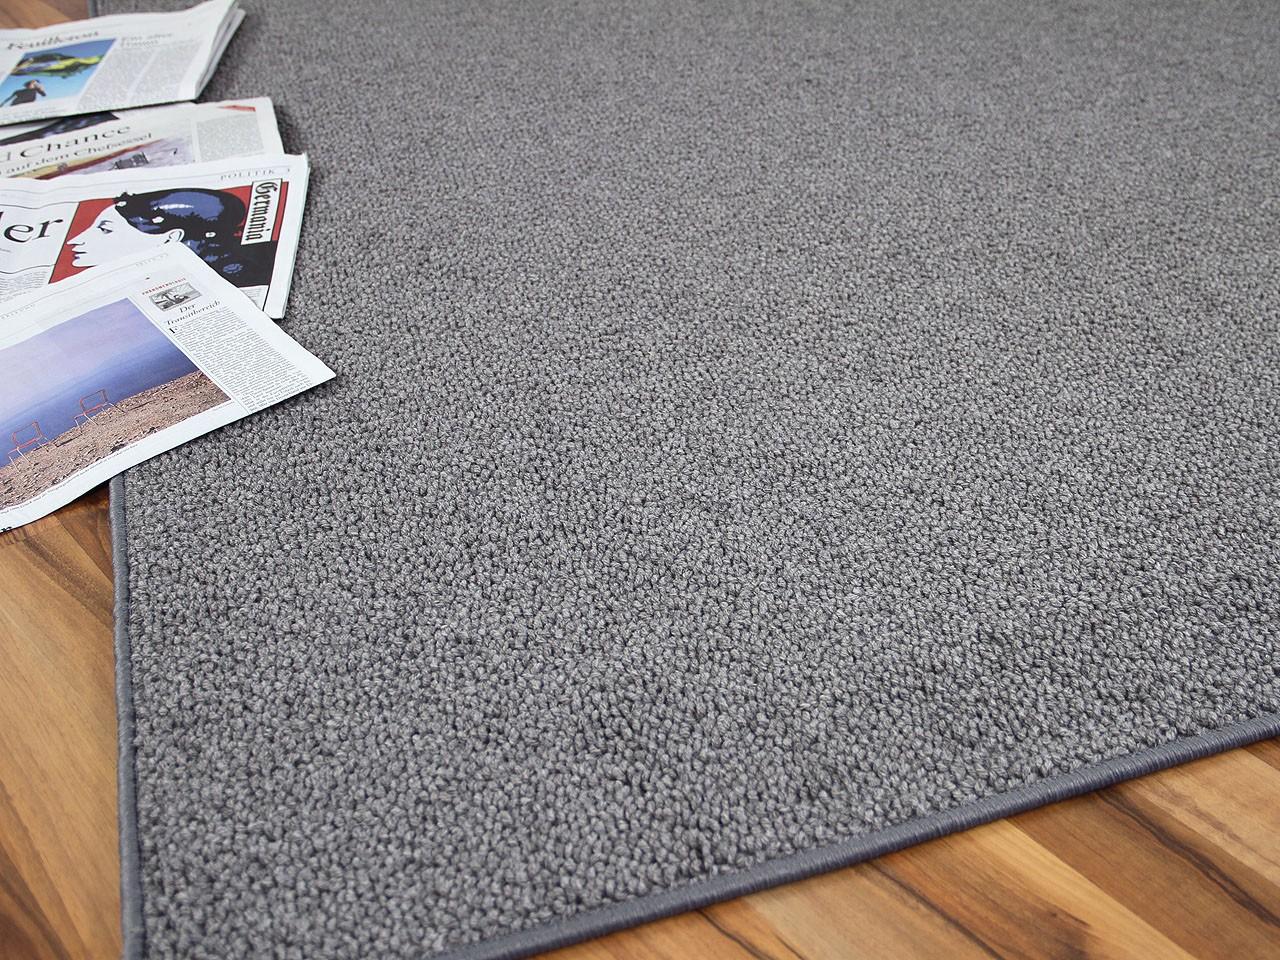 natur teppich luxus berber venice grau abverkauf teppiche sisal und naturteppiche berber teppiche. Black Bedroom Furniture Sets. Home Design Ideas